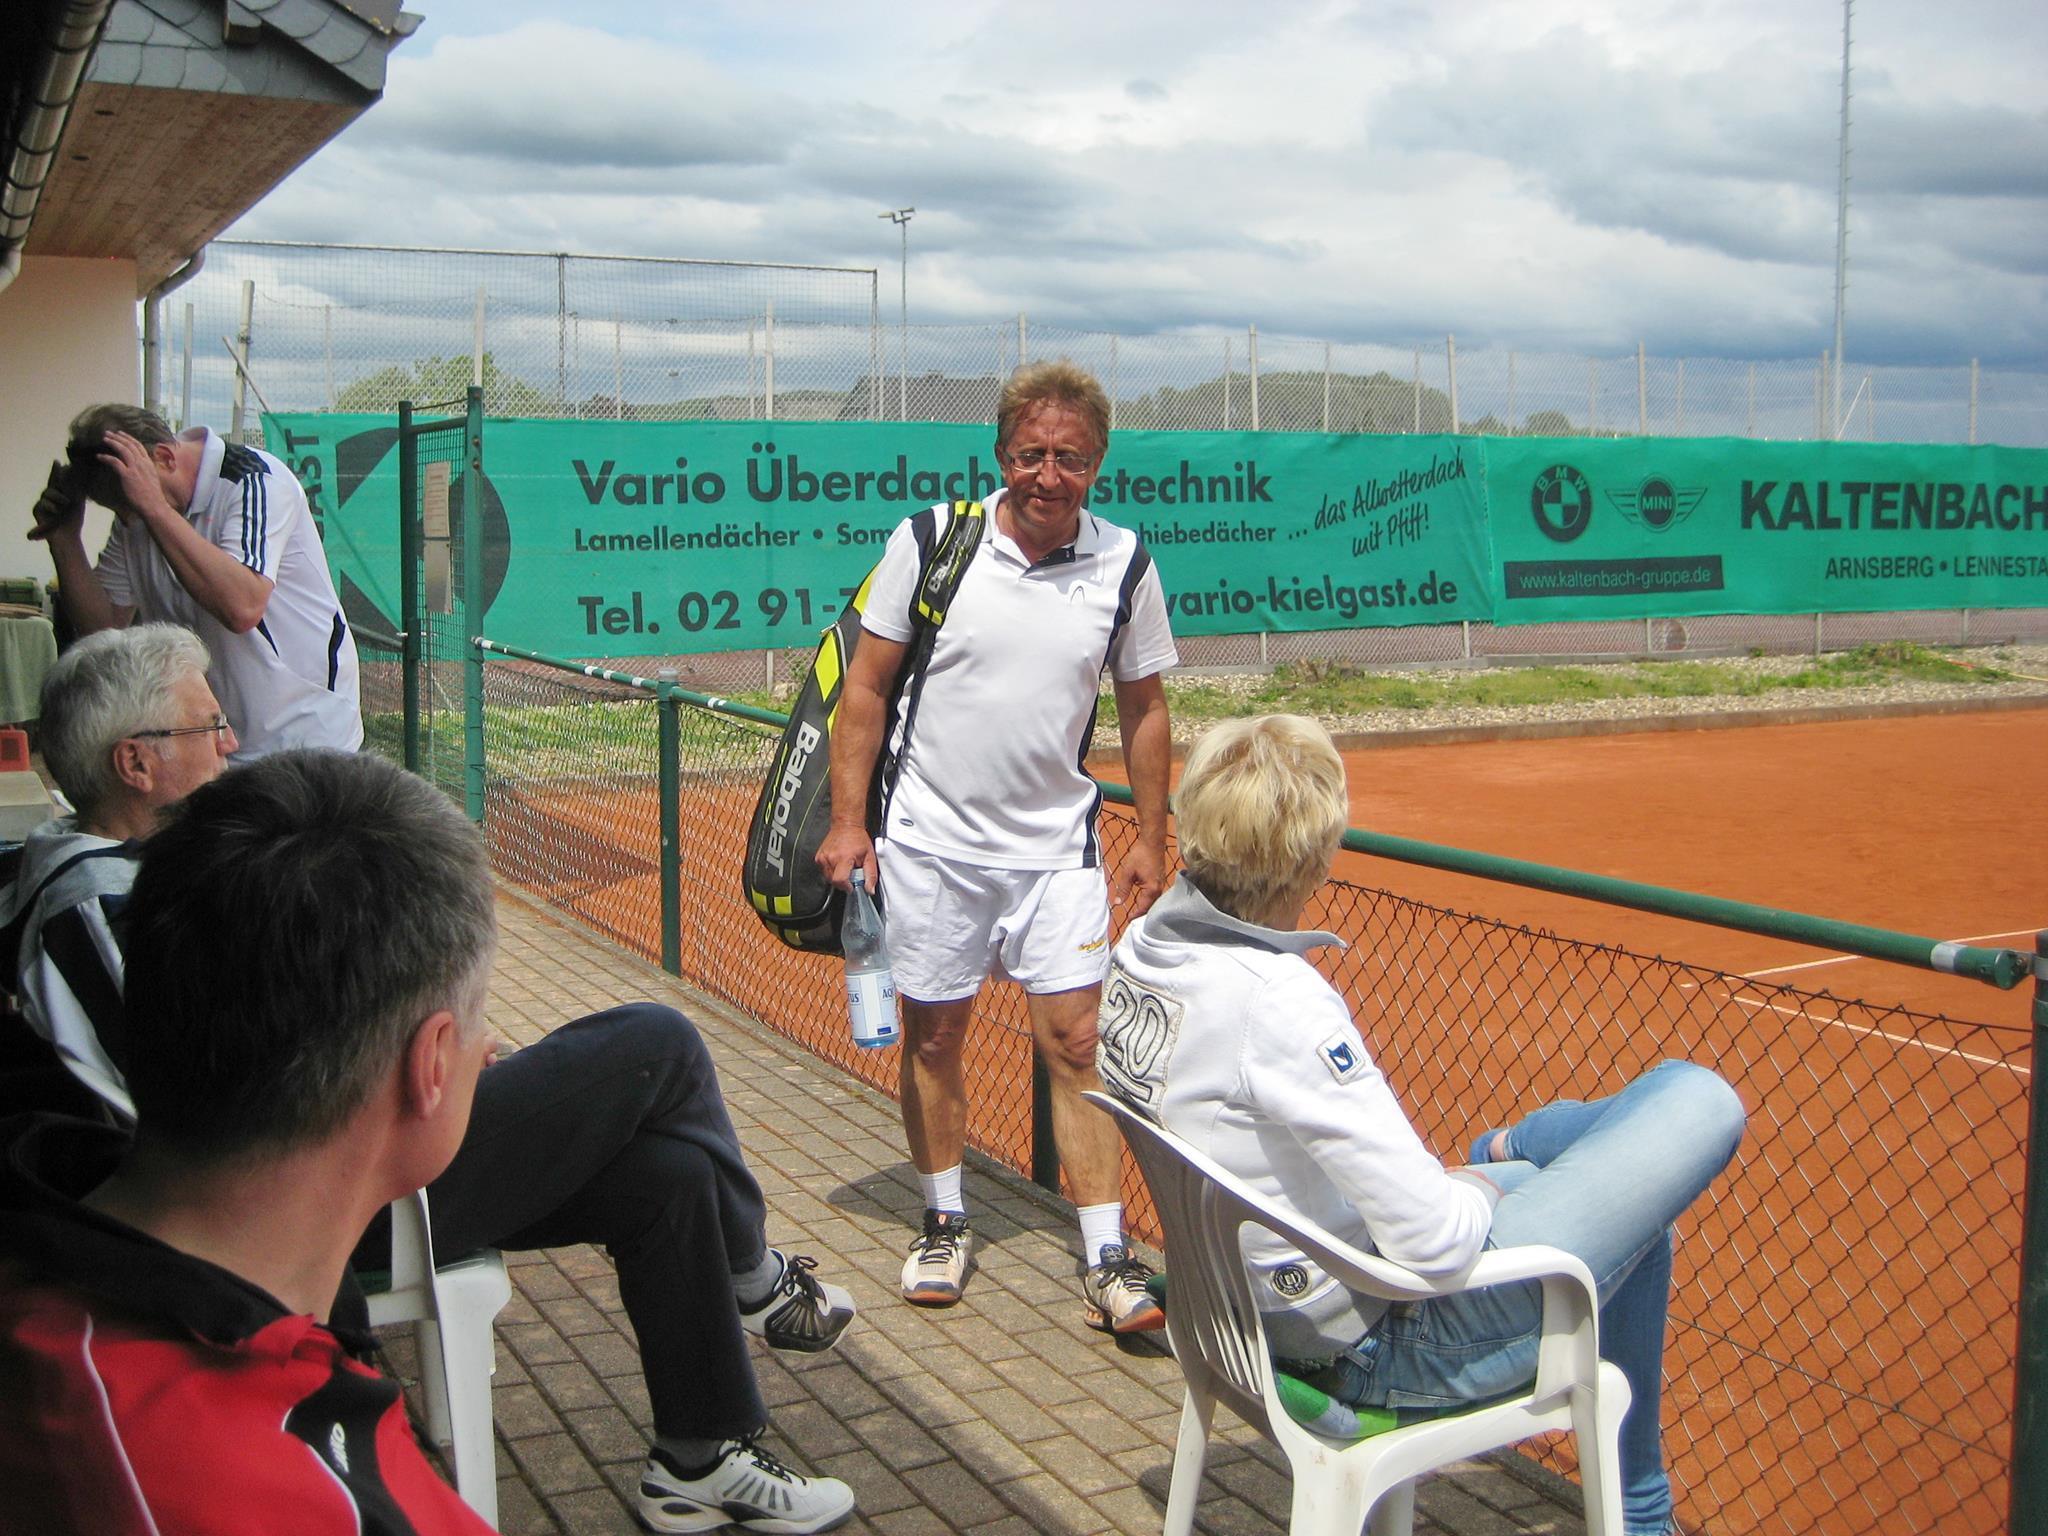 2014-05-24_tennis_08